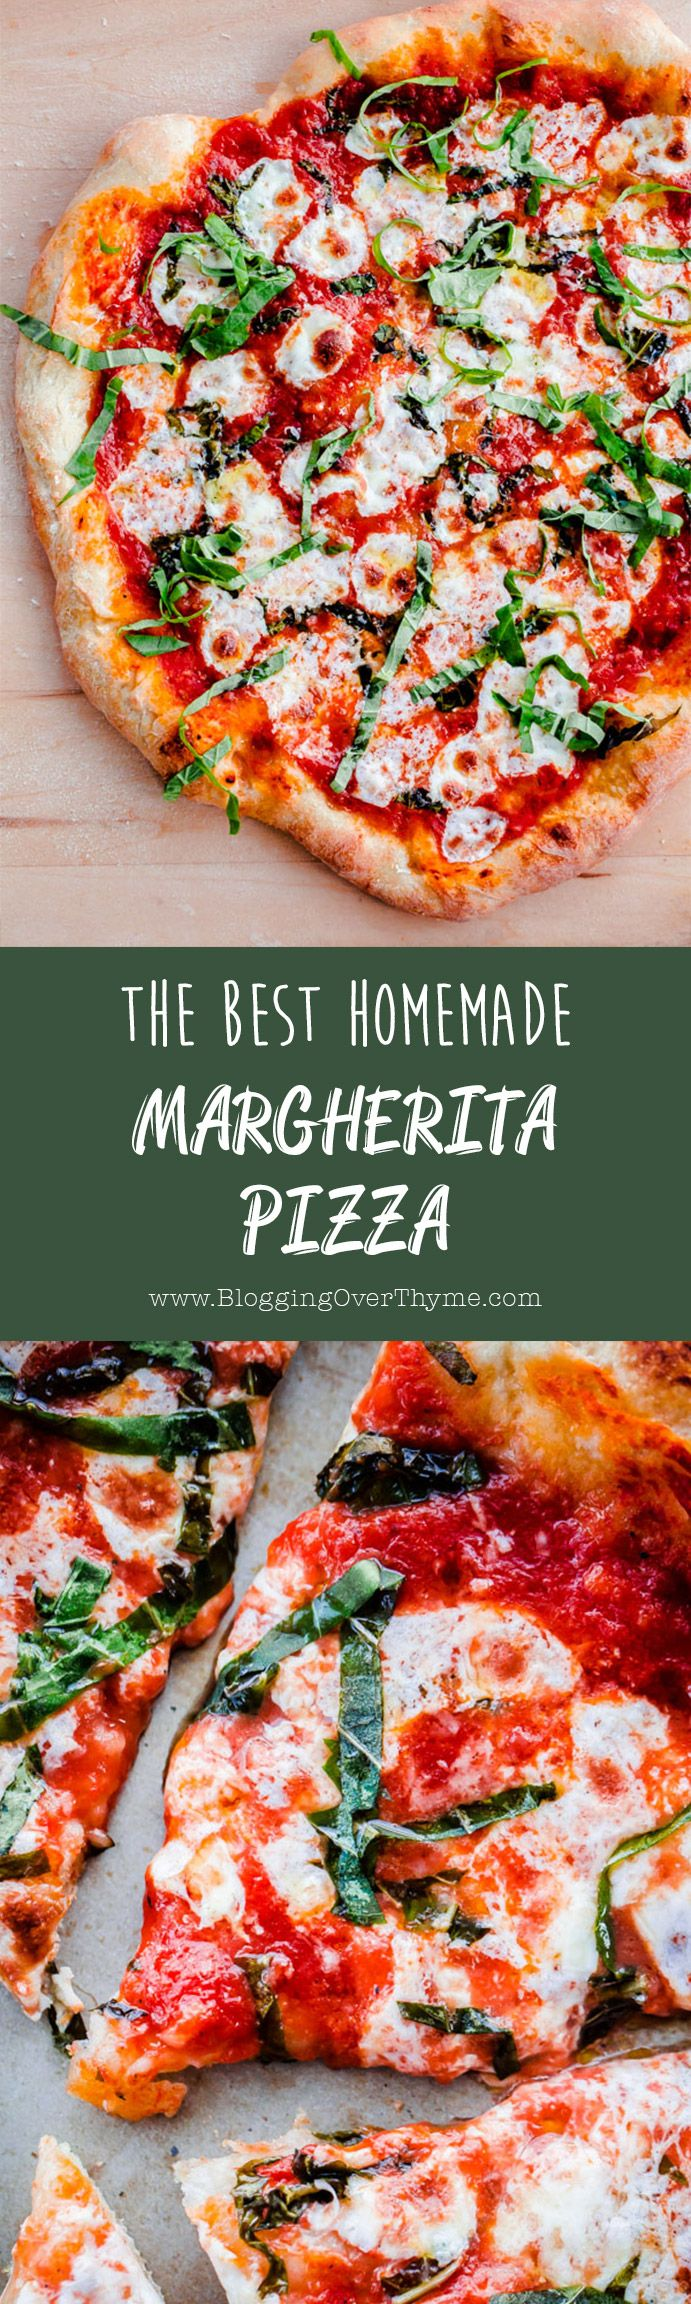 best homemade margherita pizza rezept yummy pinterest pizza pizza rezept und essen. Black Bedroom Furniture Sets. Home Design Ideas